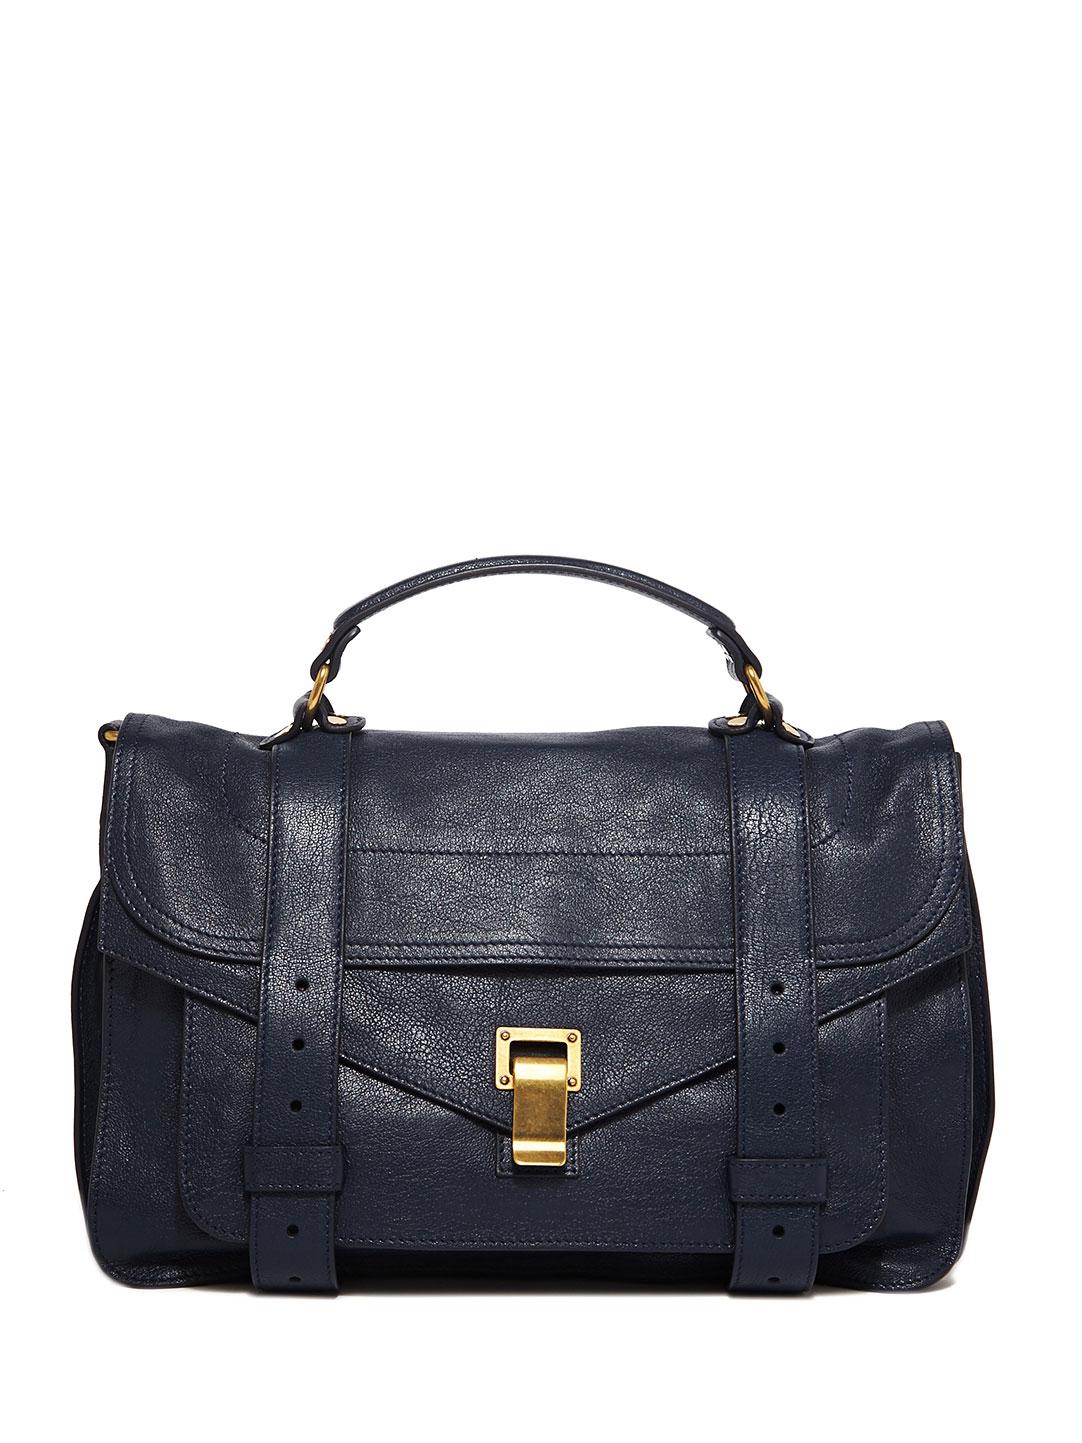 Lyst Proenza Schouler Womens Ps1 Medium Leather Bag In Blue